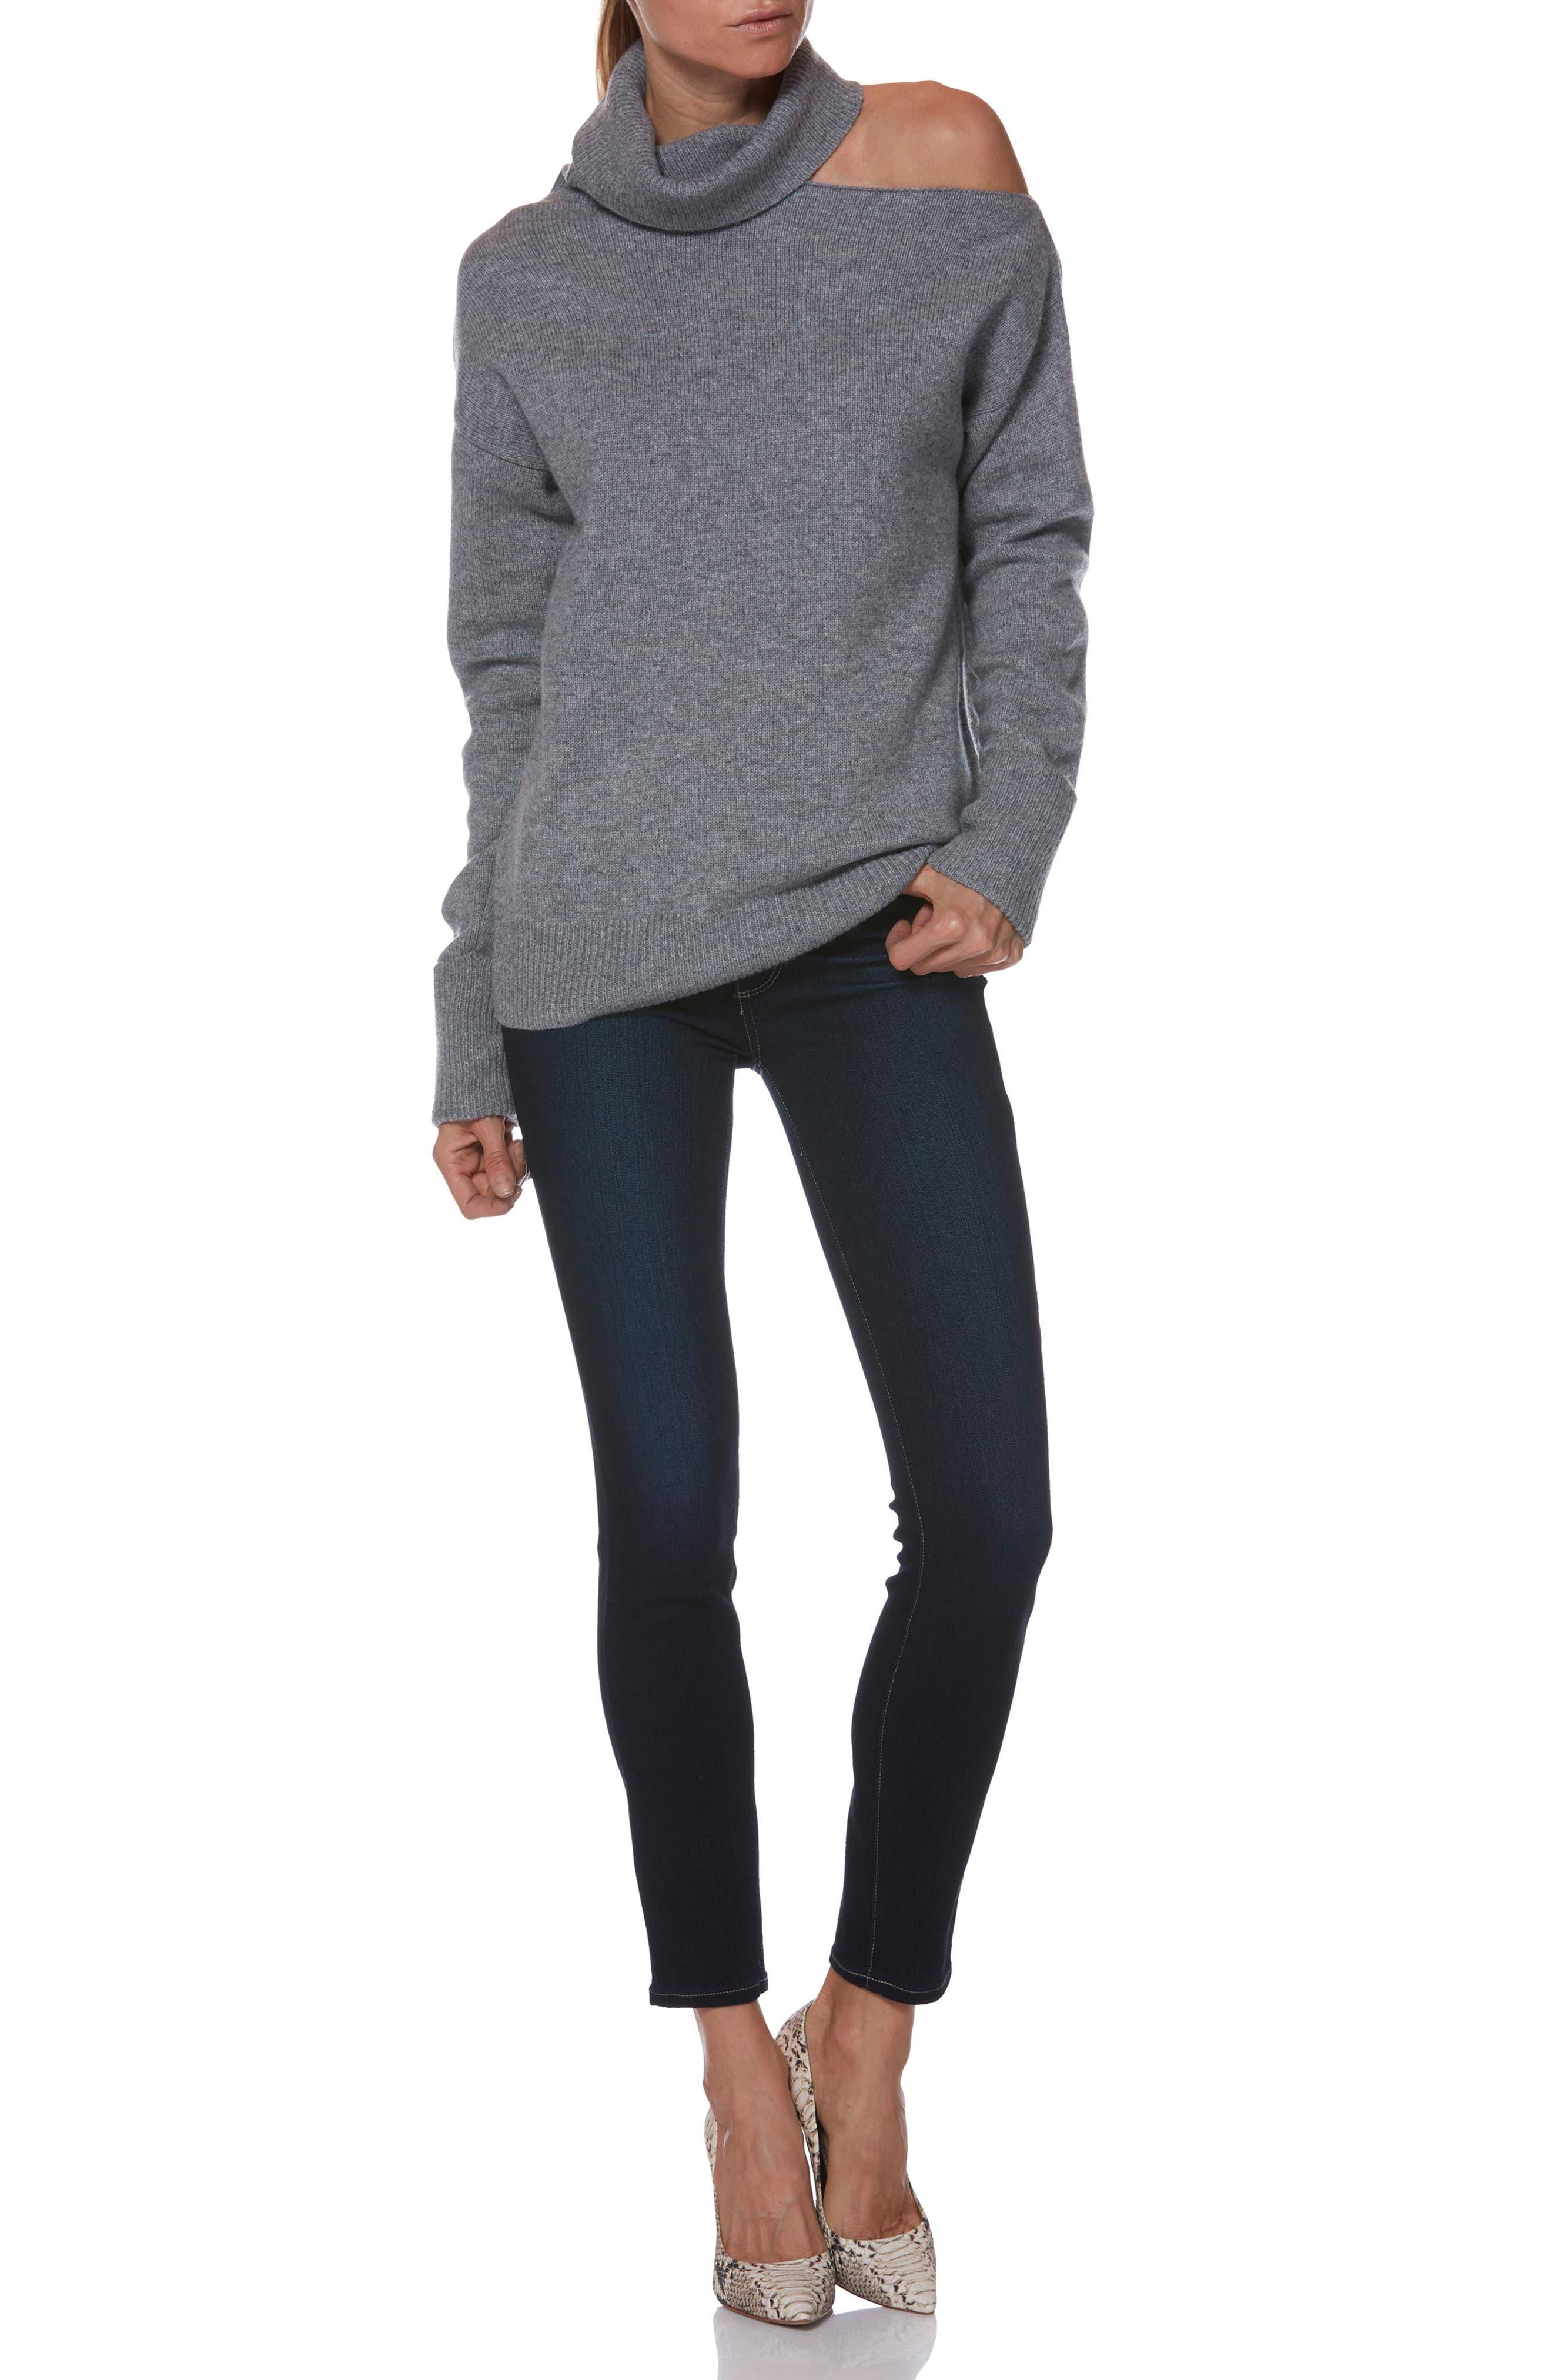 Raundi Cutout Shoulder Sweater,                             Alternate thumbnail 4, color,                             HEATHER GREY